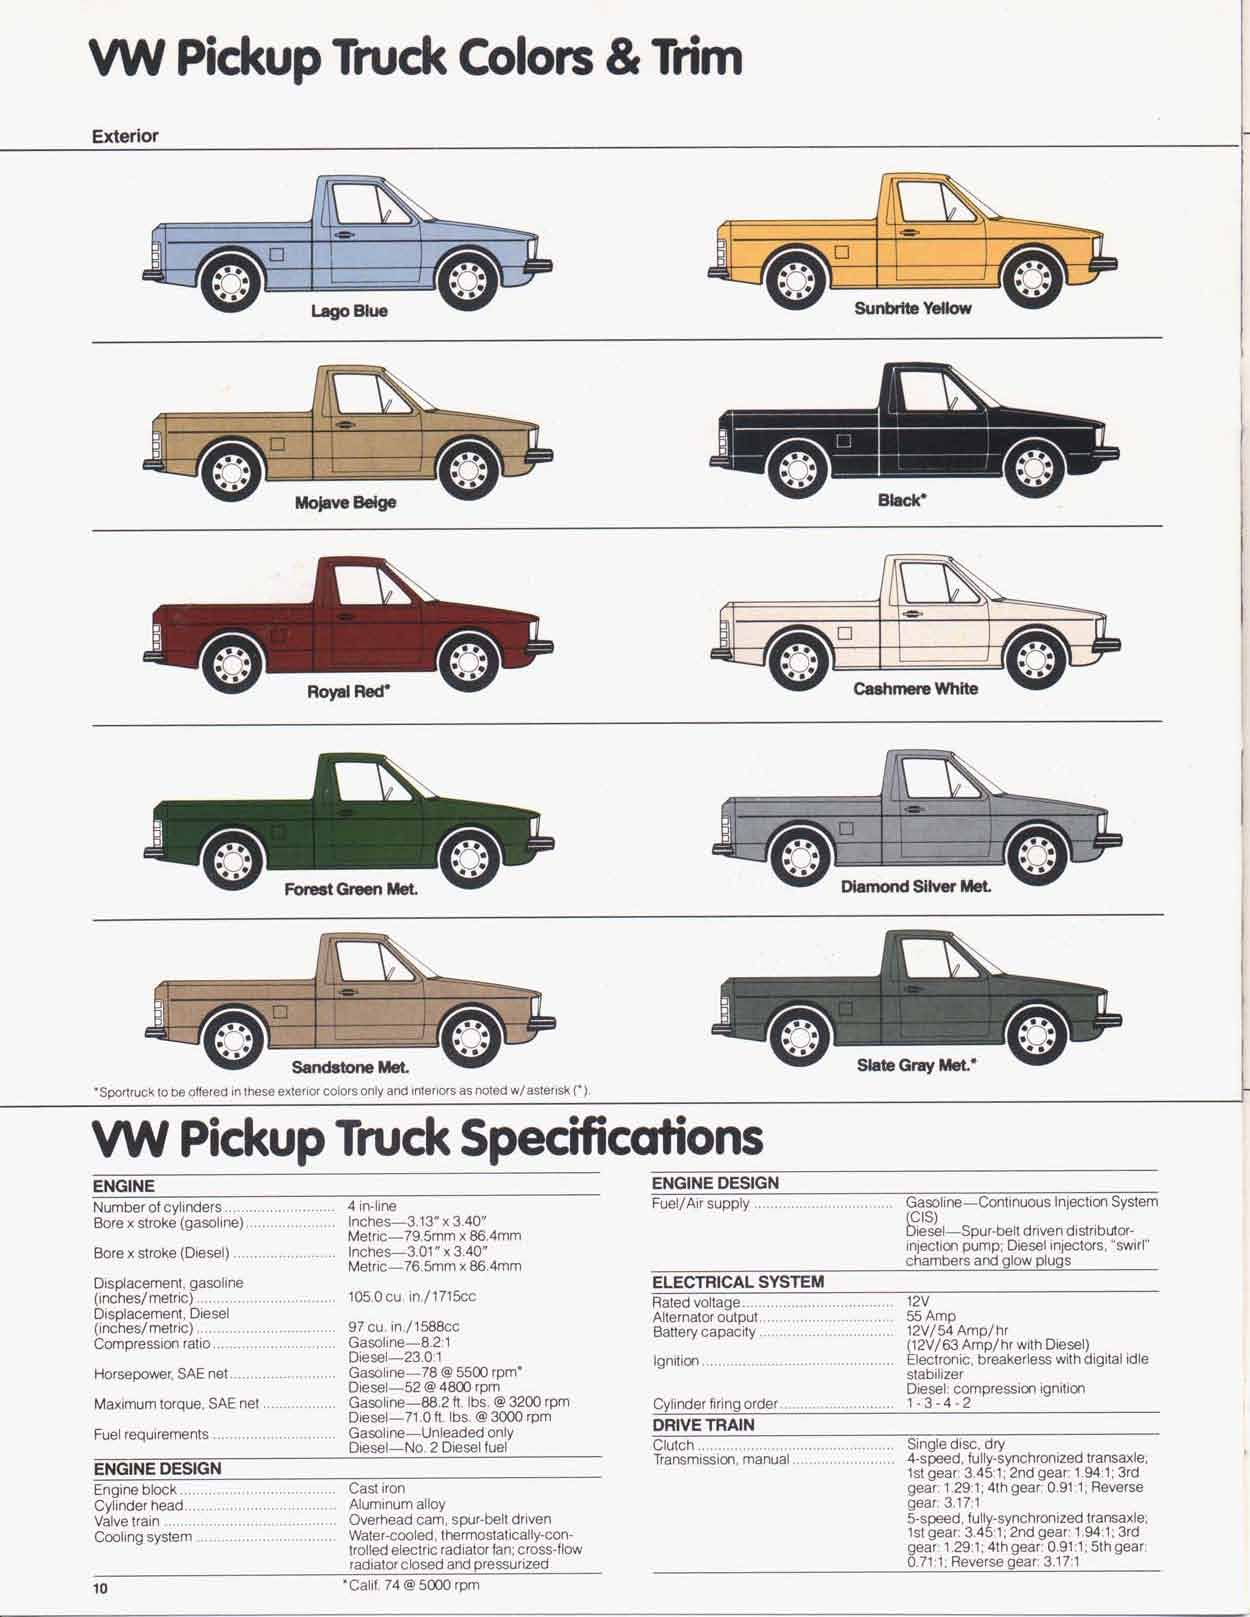 TheSamba.com :: VW Archives - 1981 VW Rabbit Pickup Brochure